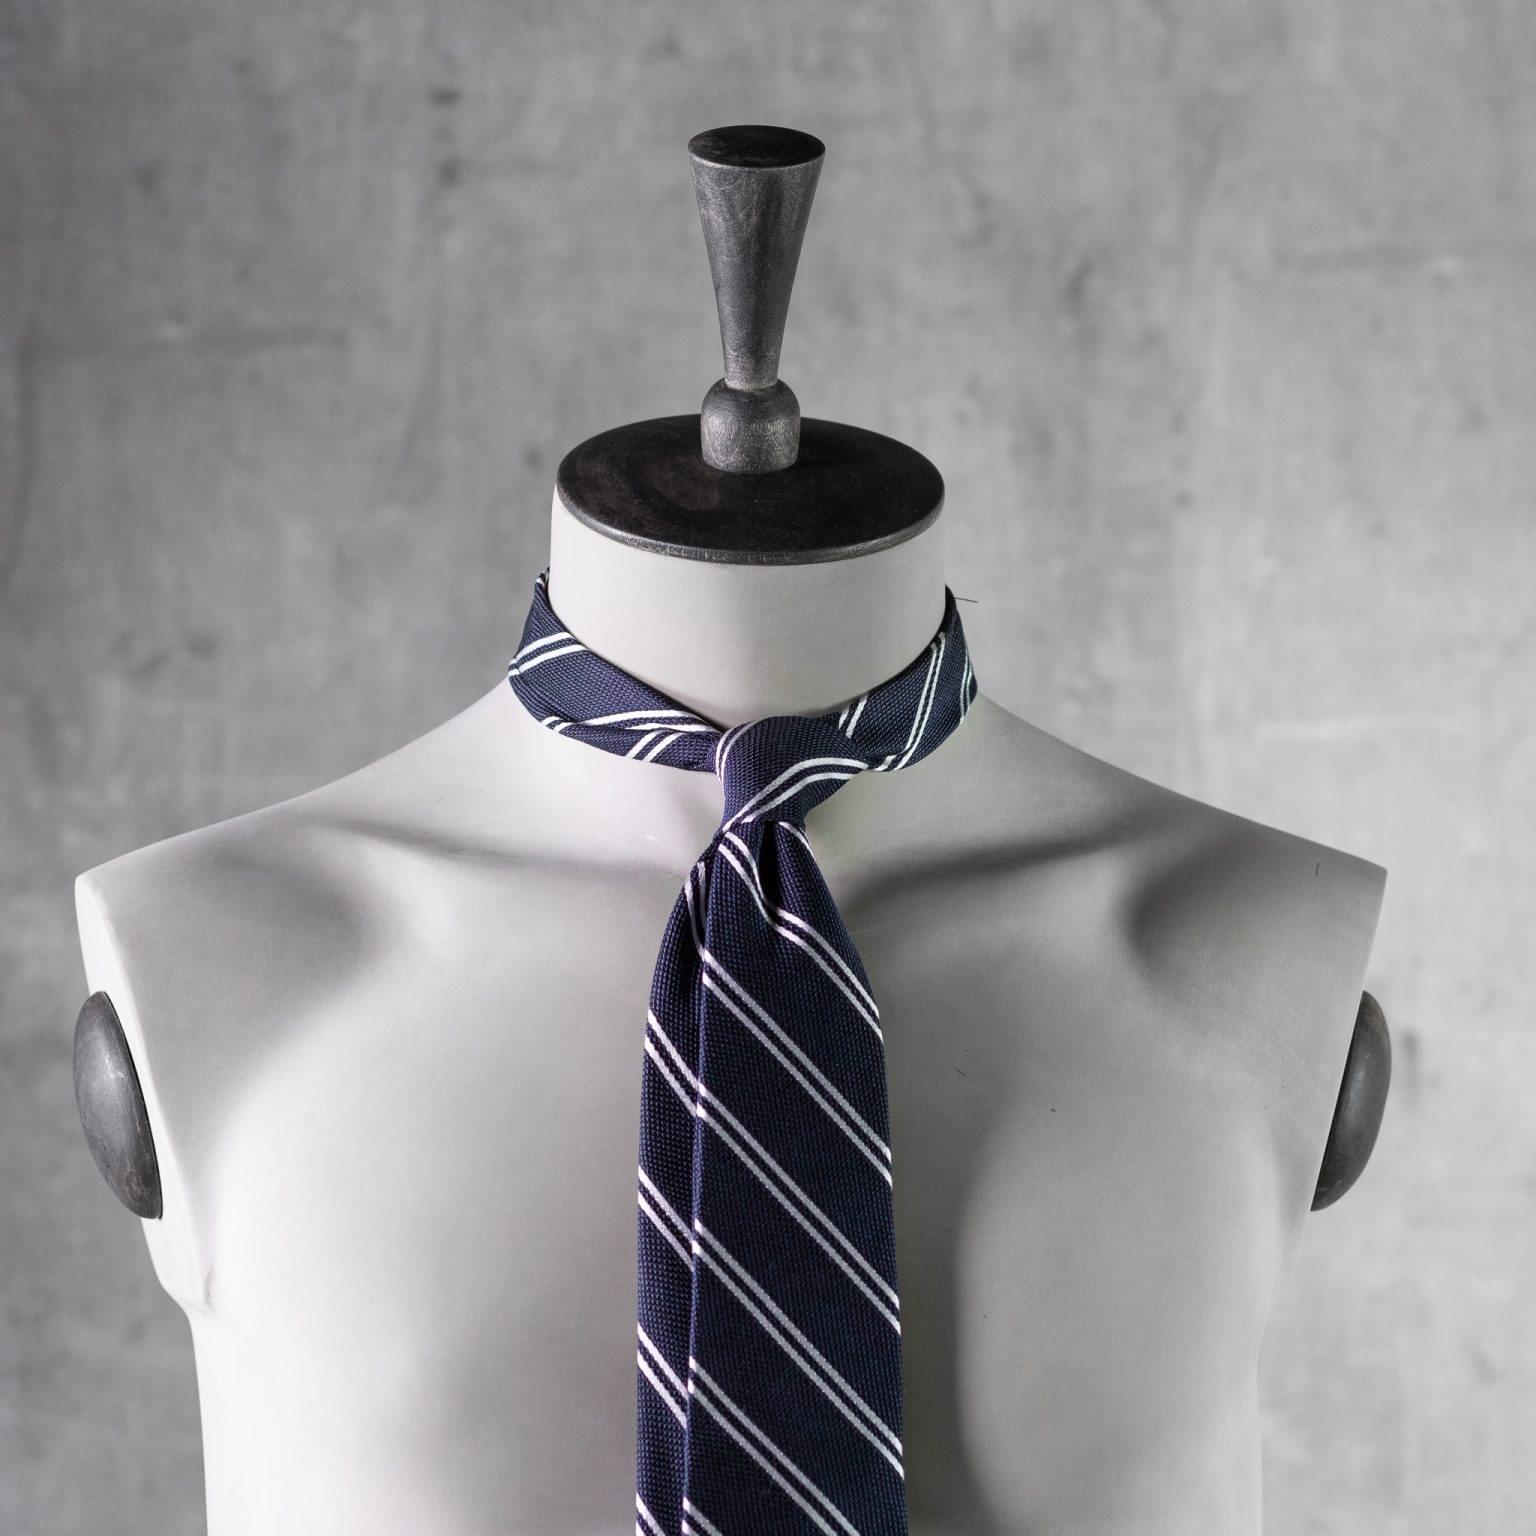 GRENADINE-0442-Tie-Initials-Corbata-Iniciales-The-Seelk-3